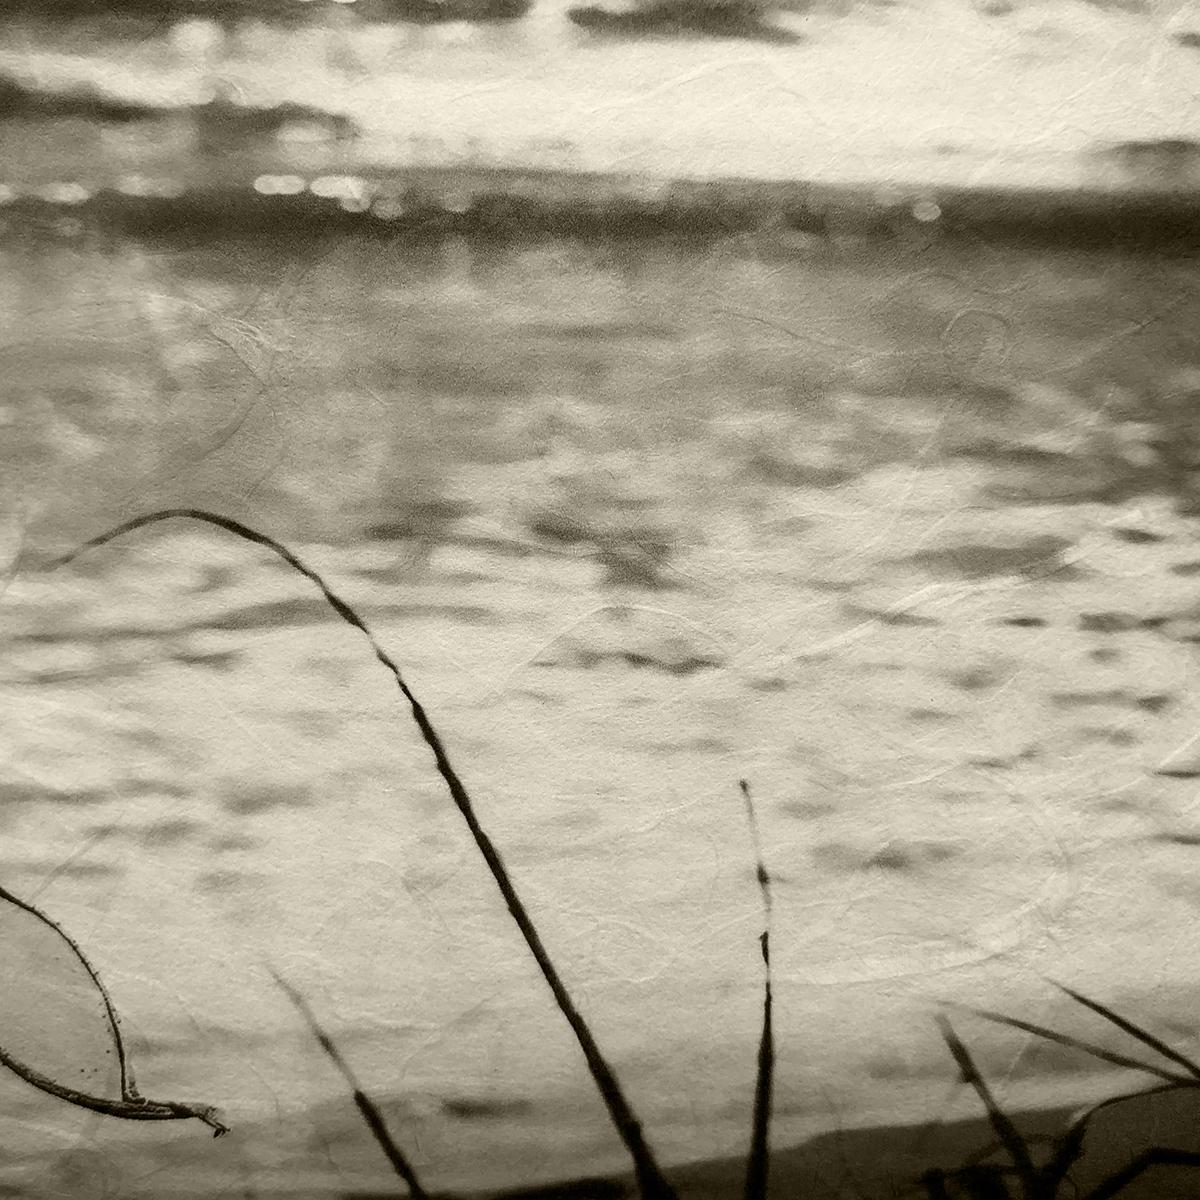 Ashi (Reeds)